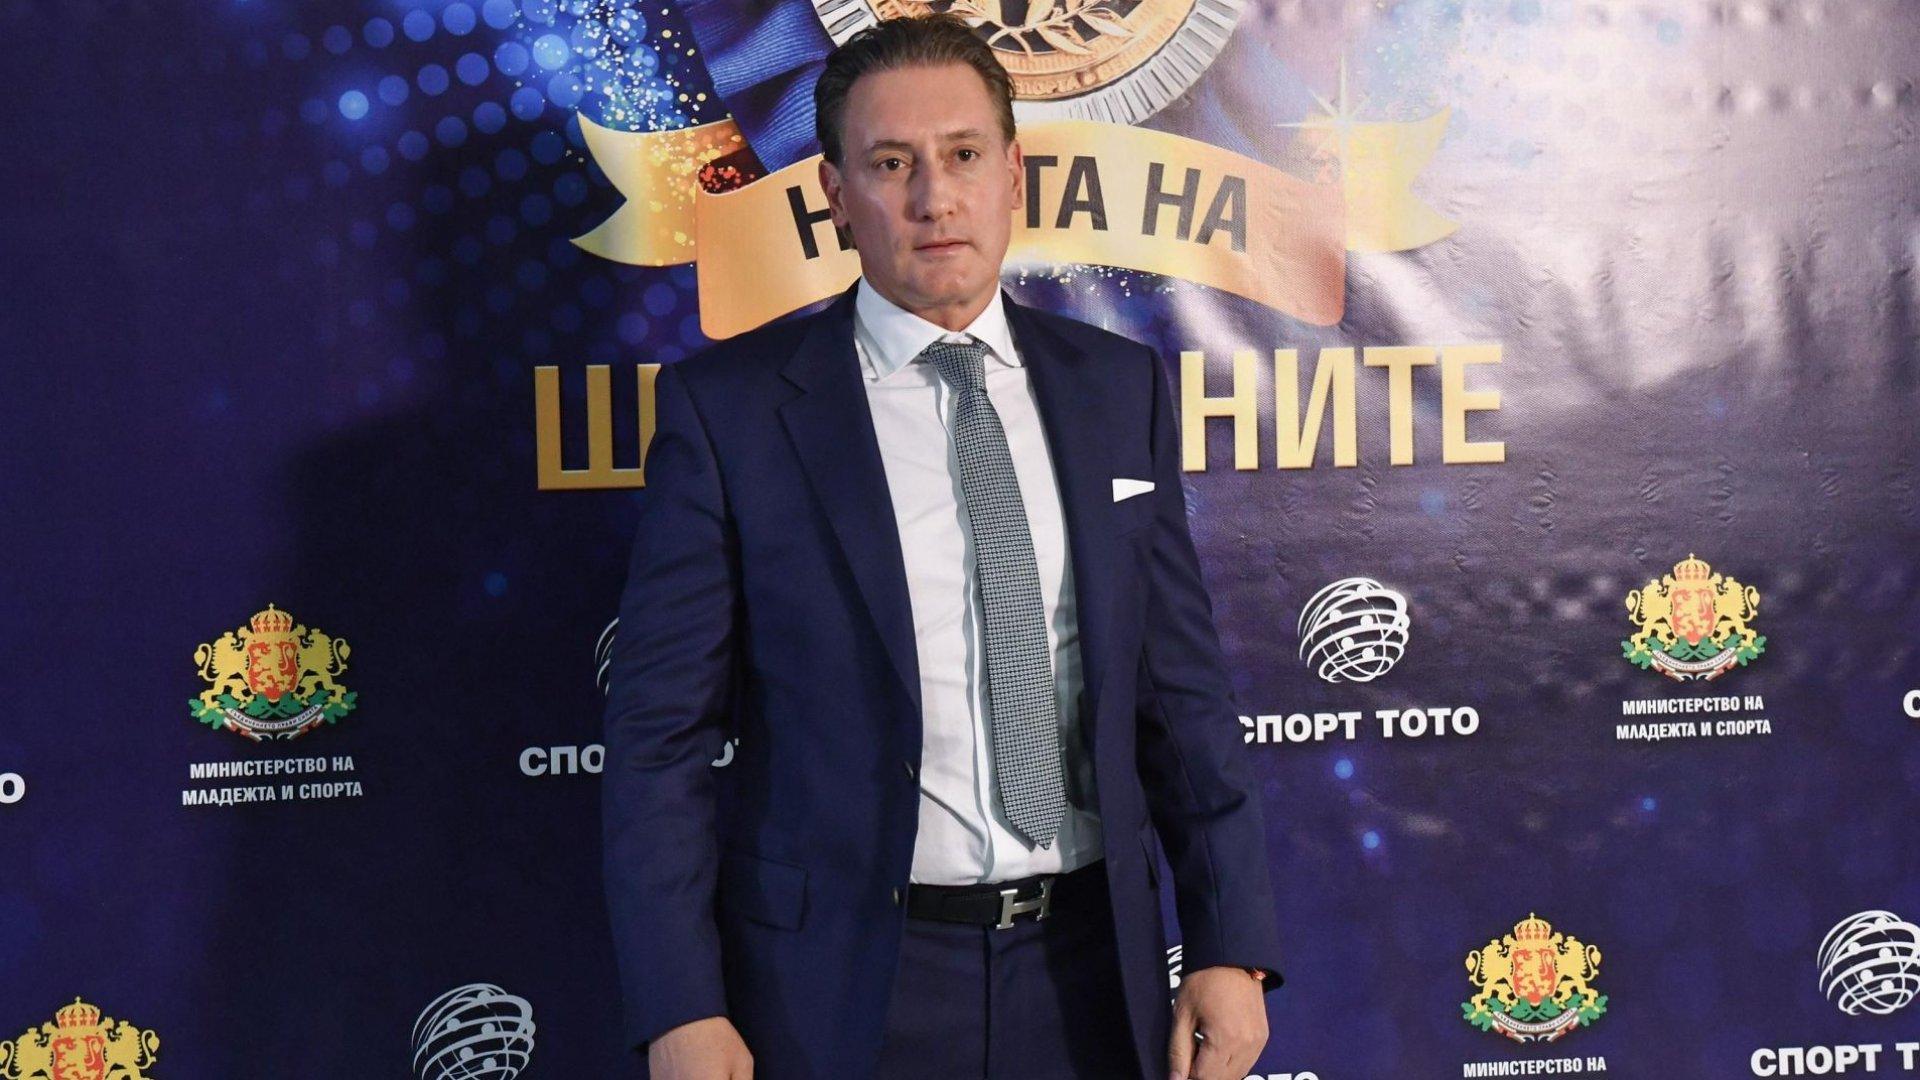 Кирил Домусчиев осигури важно лекарство срещу коронавируса